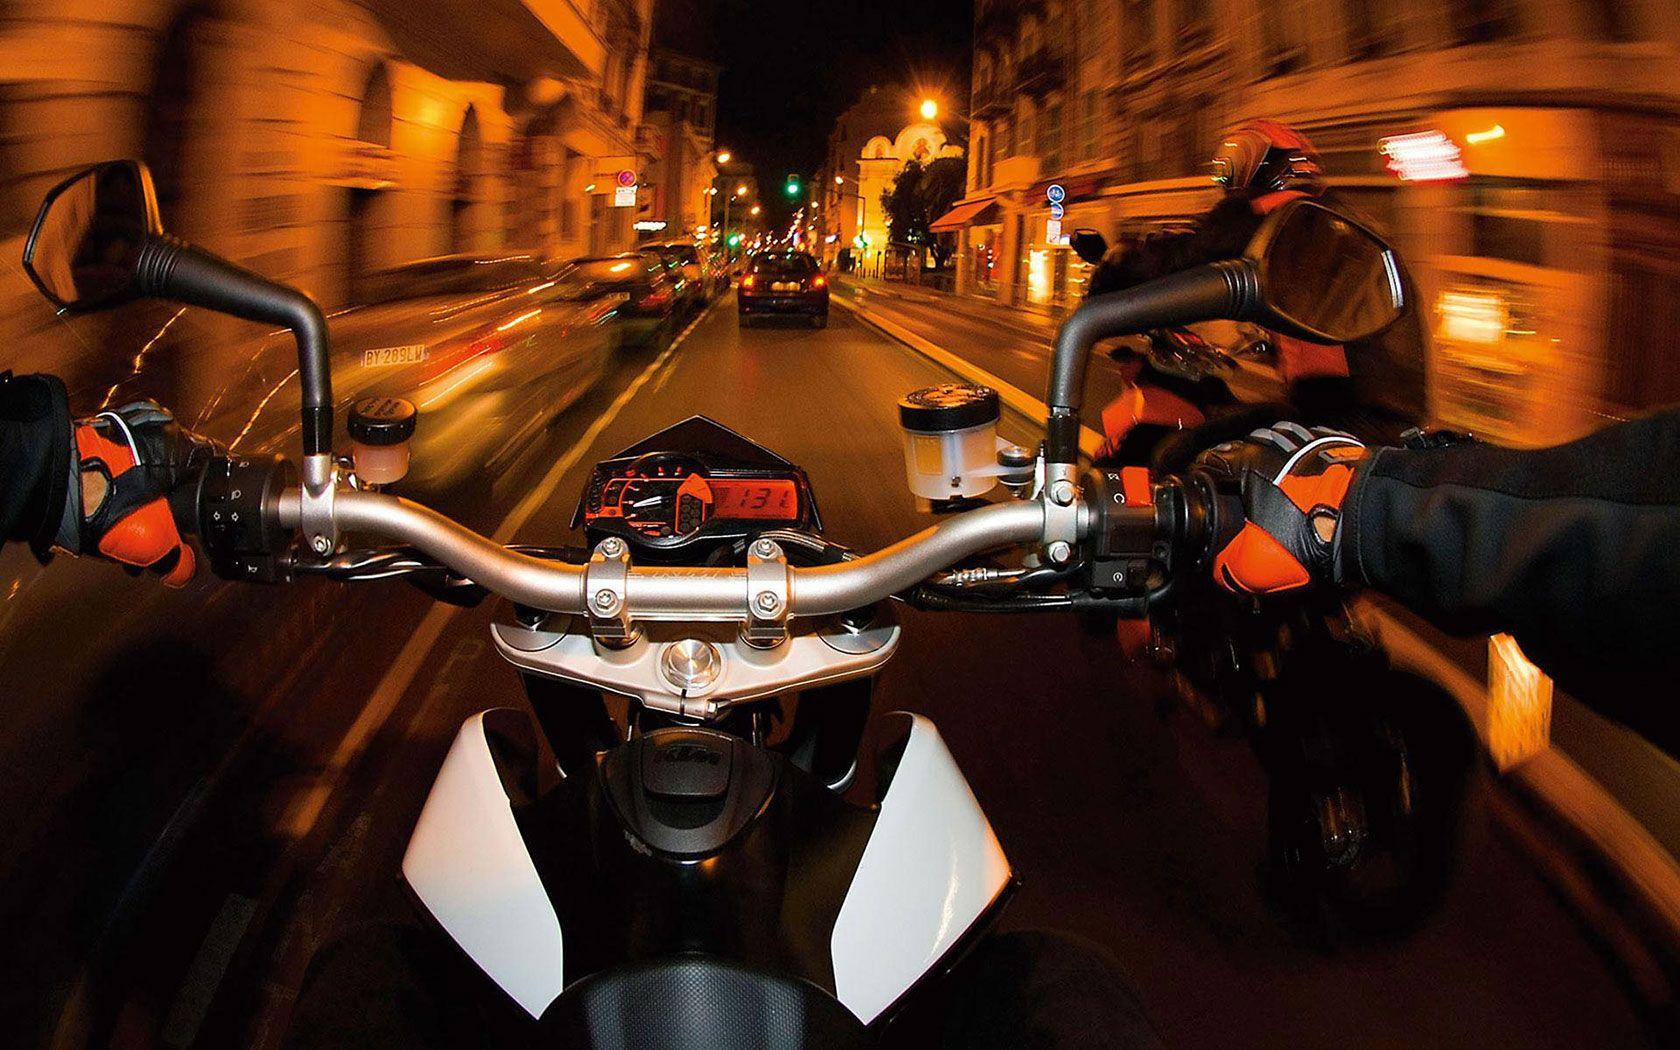 Motorcycle Ride Wallpaper